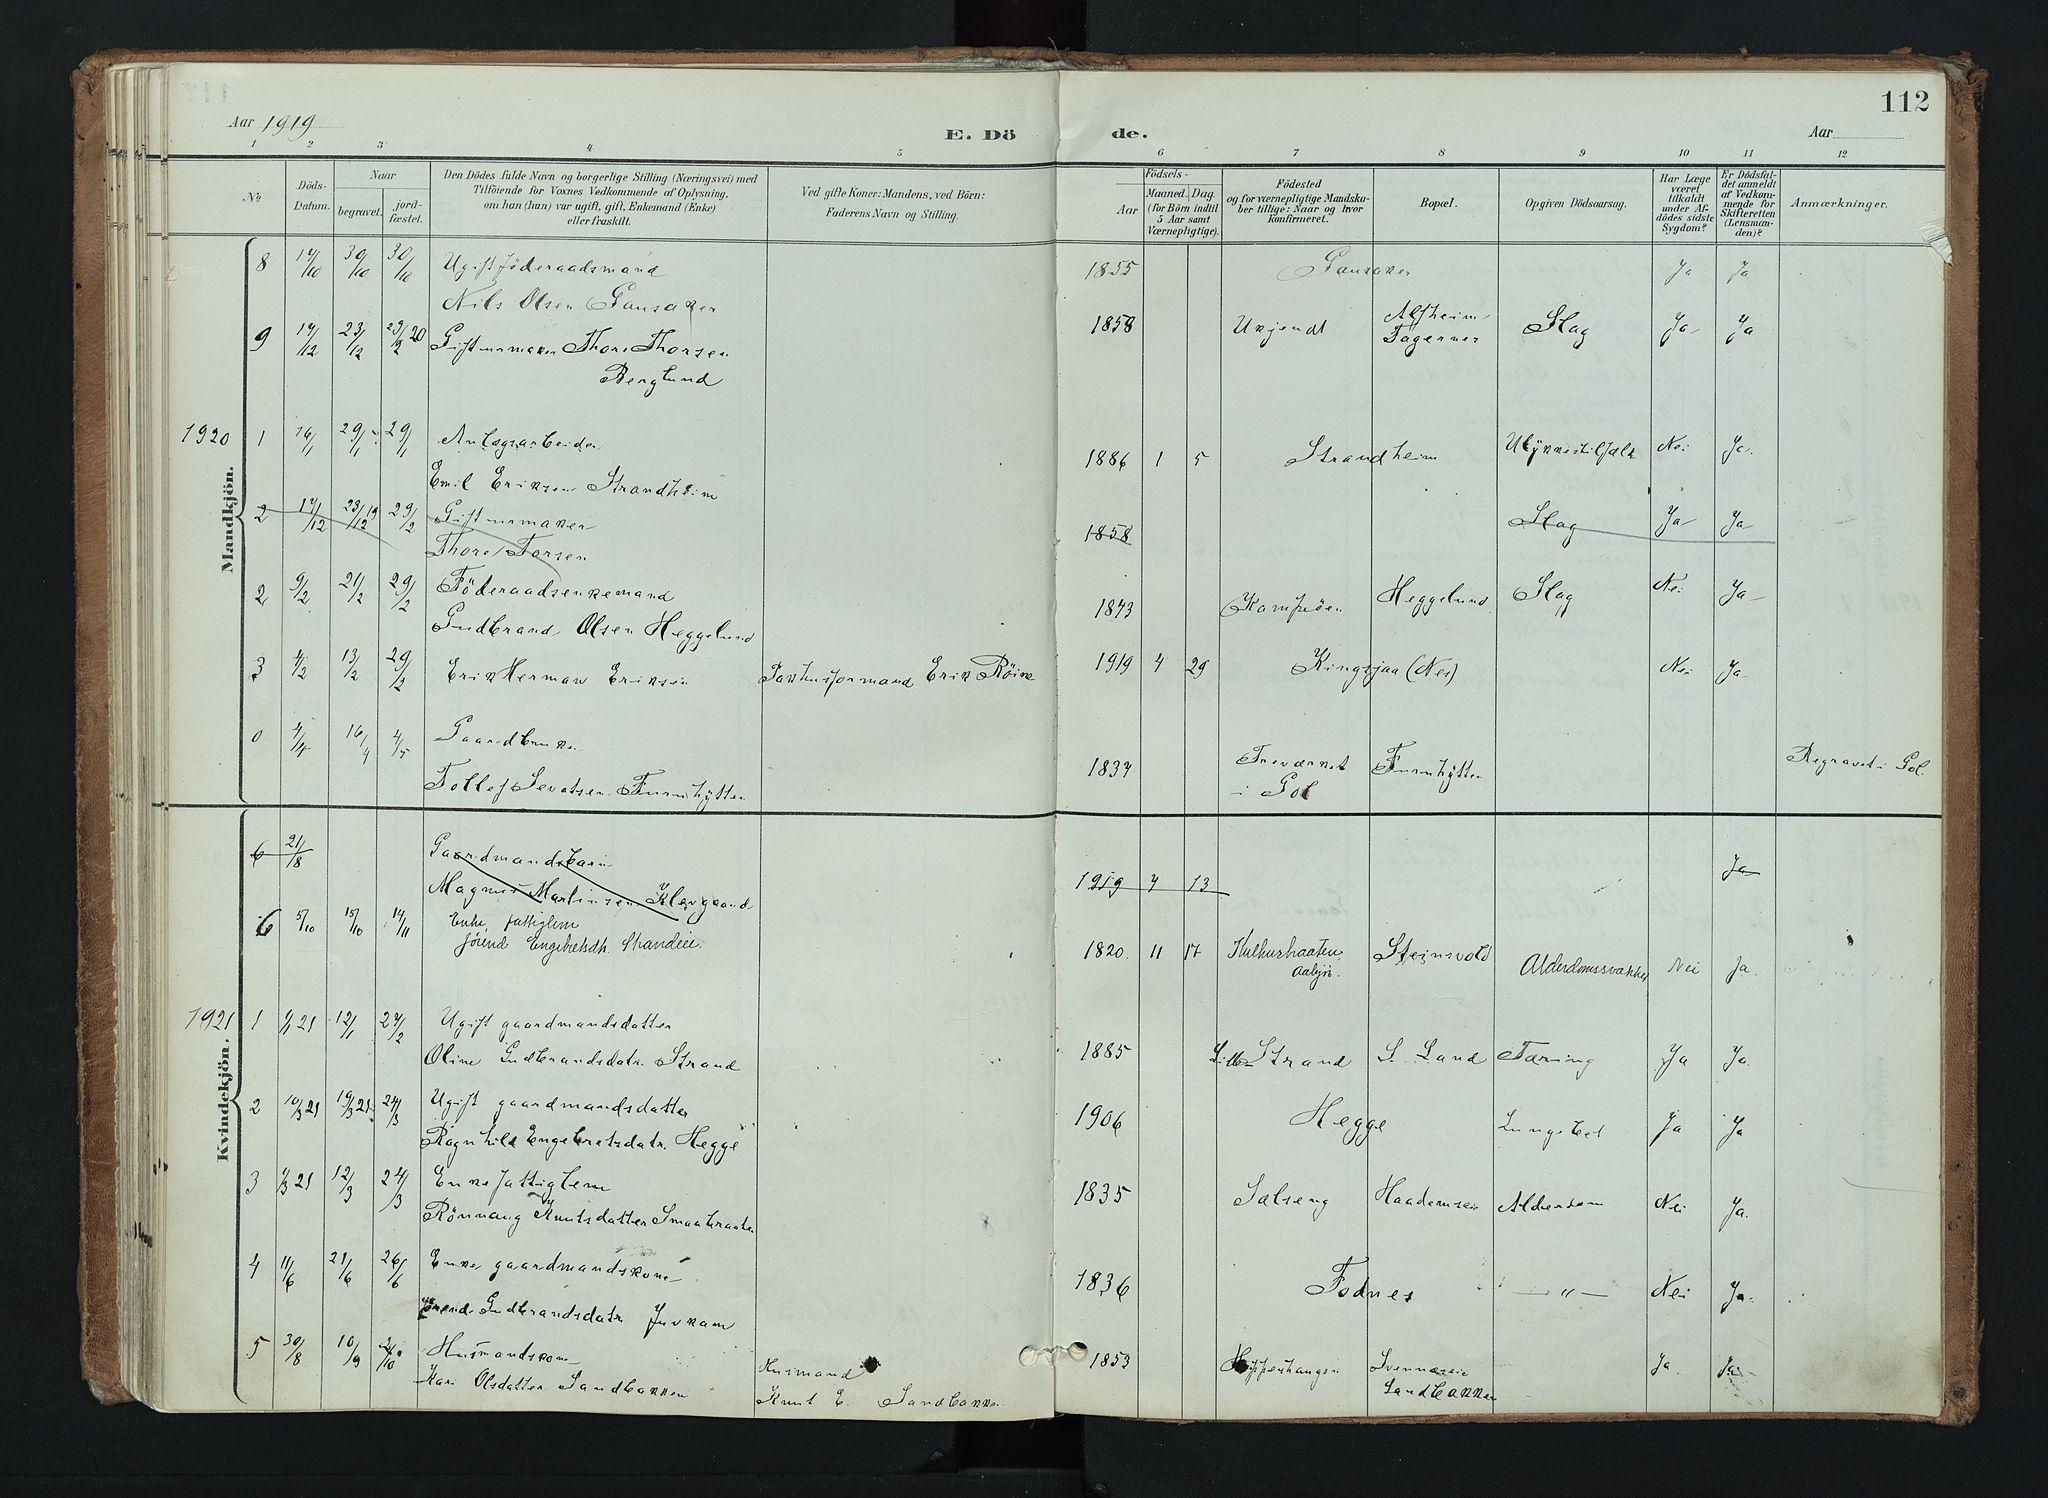 SAH, Nord-Aurdal prestekontor, Ministerialbok nr. 16, 1897-1925, s. 112